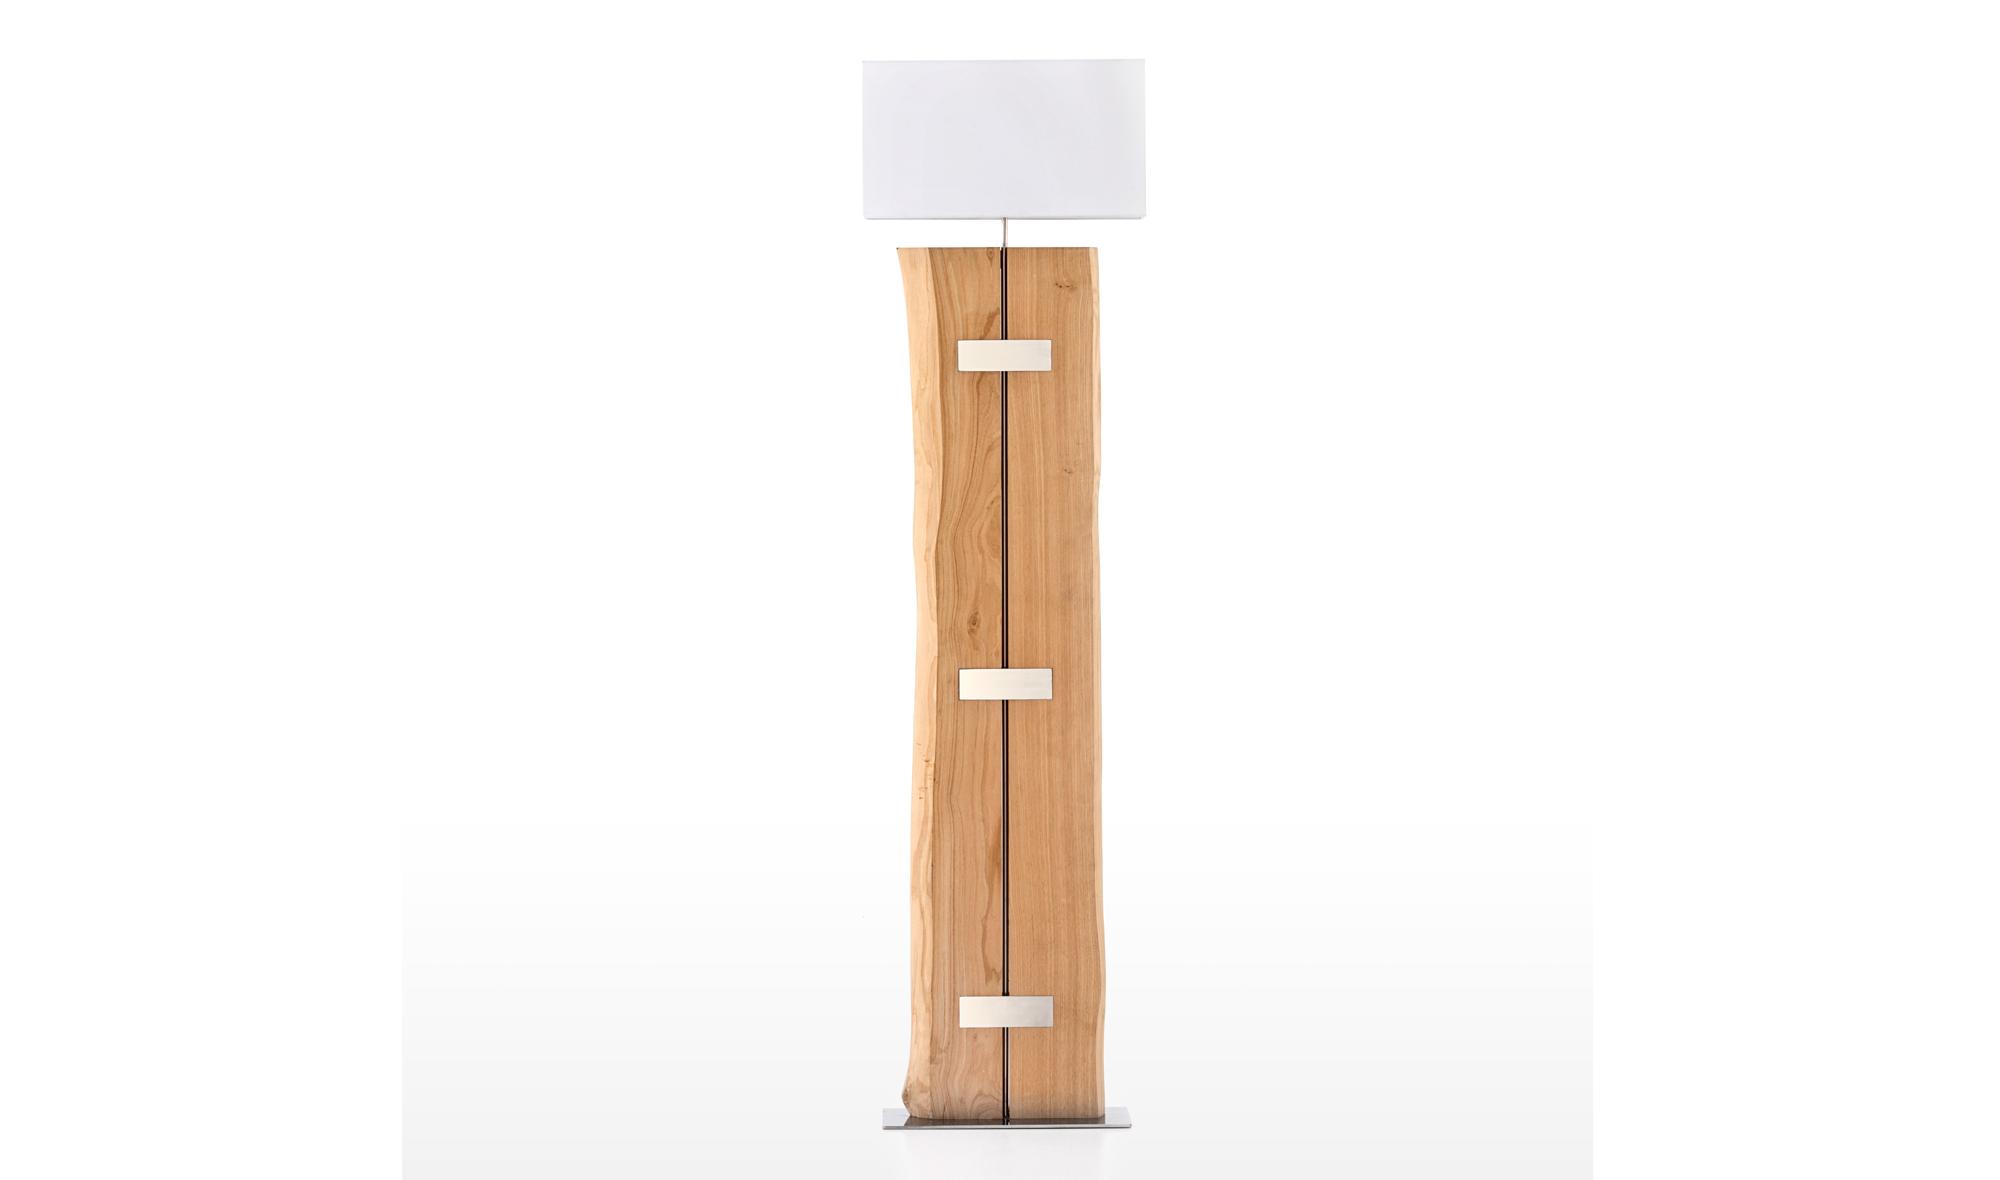 Muebles Martin Peñasco:  Lámpara de pie castaño nórdico Jasper - Lámparas de Pie - Iluminación